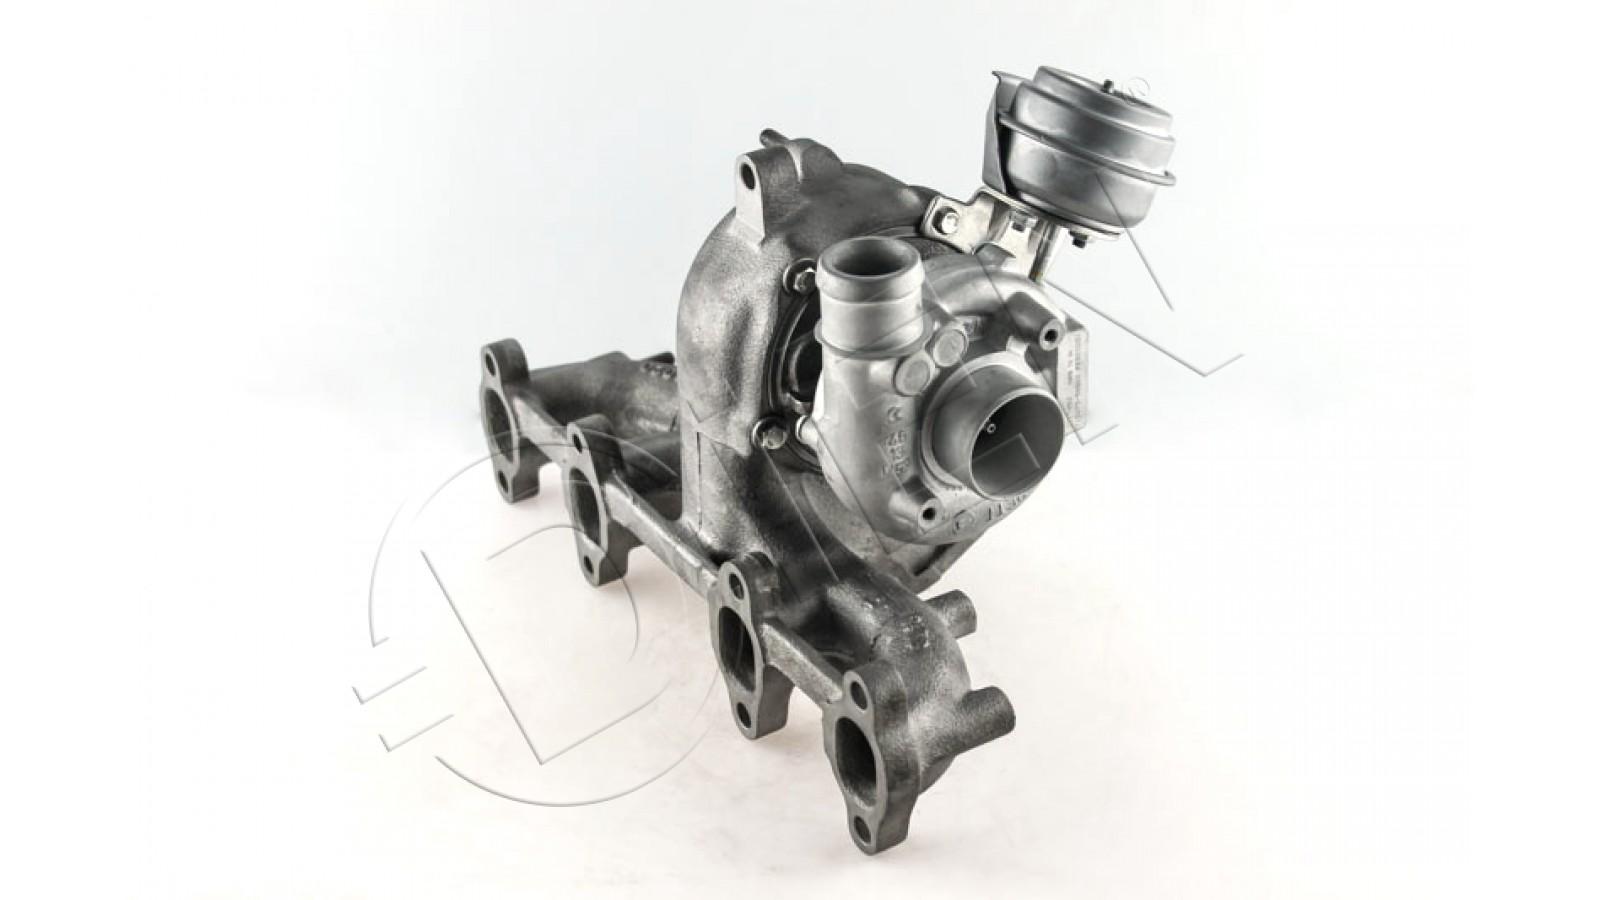 Turbocompressore  VOLKSWAGEN  SHARAN  1.9 TDI  150Cv  1896ccm  giu 2005 - mar 2010